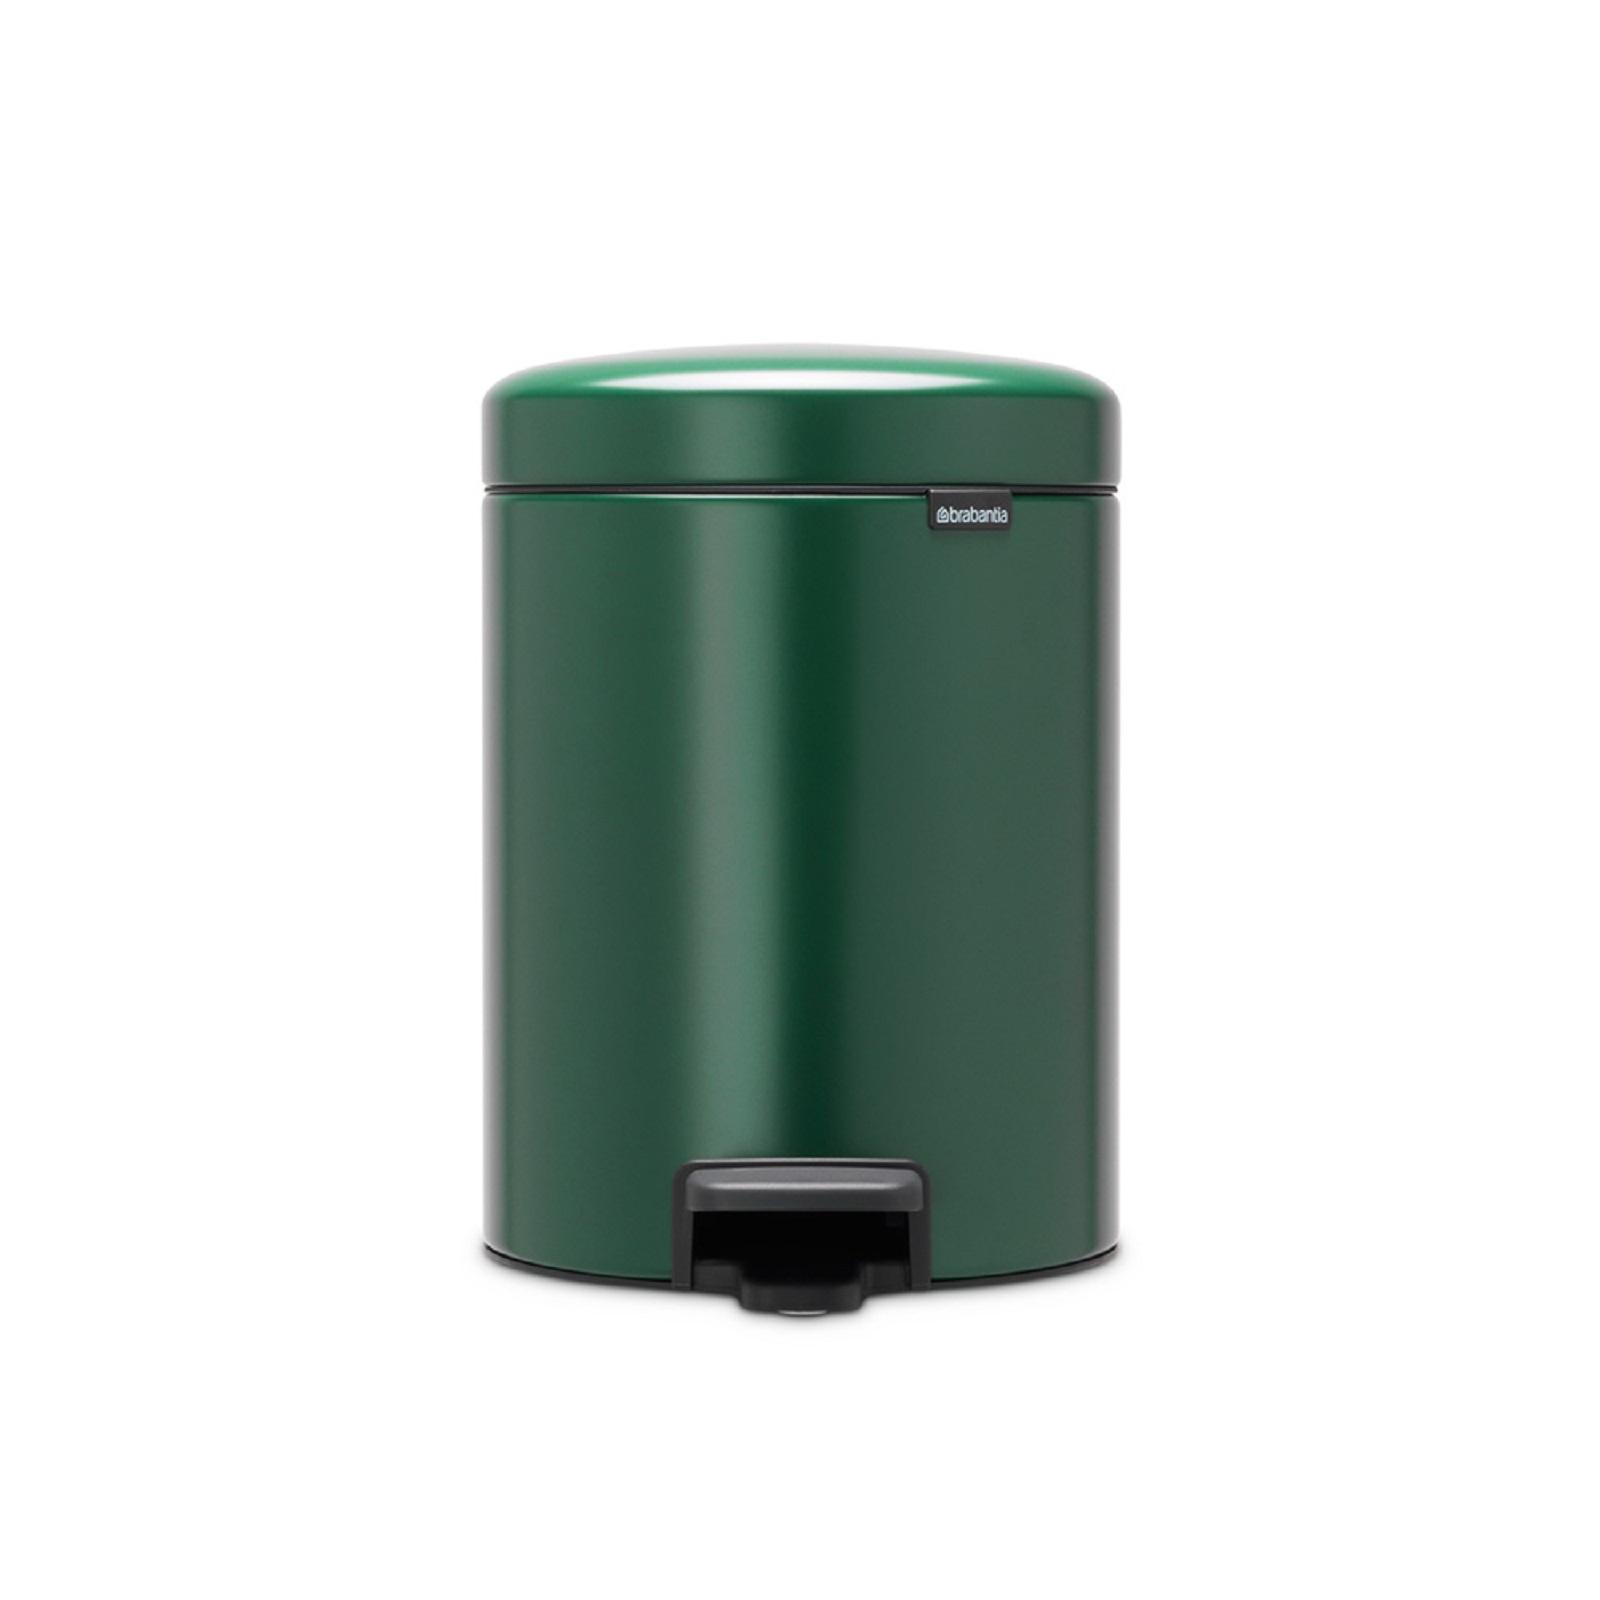 Онлайн каталог PROMENU: Бак для мусора Pedal Bin NewIcon Brabantia, объем 5 л, зеленый  304026